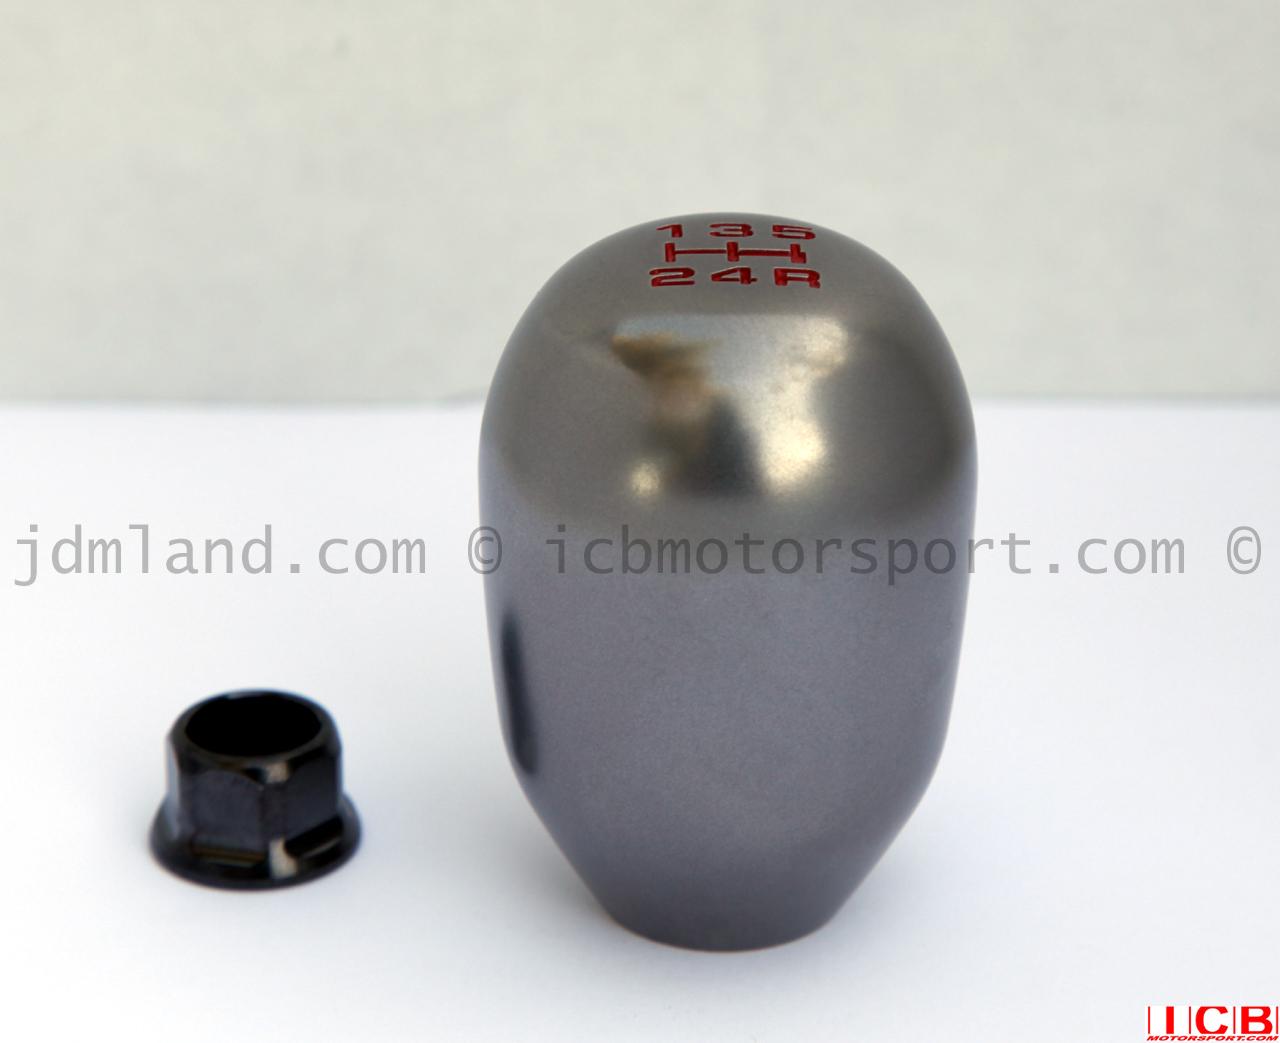 used jdm ek9 dc2 type r titanium shift knob mint condition. Black Bedroom Furniture Sets. Home Design Ideas